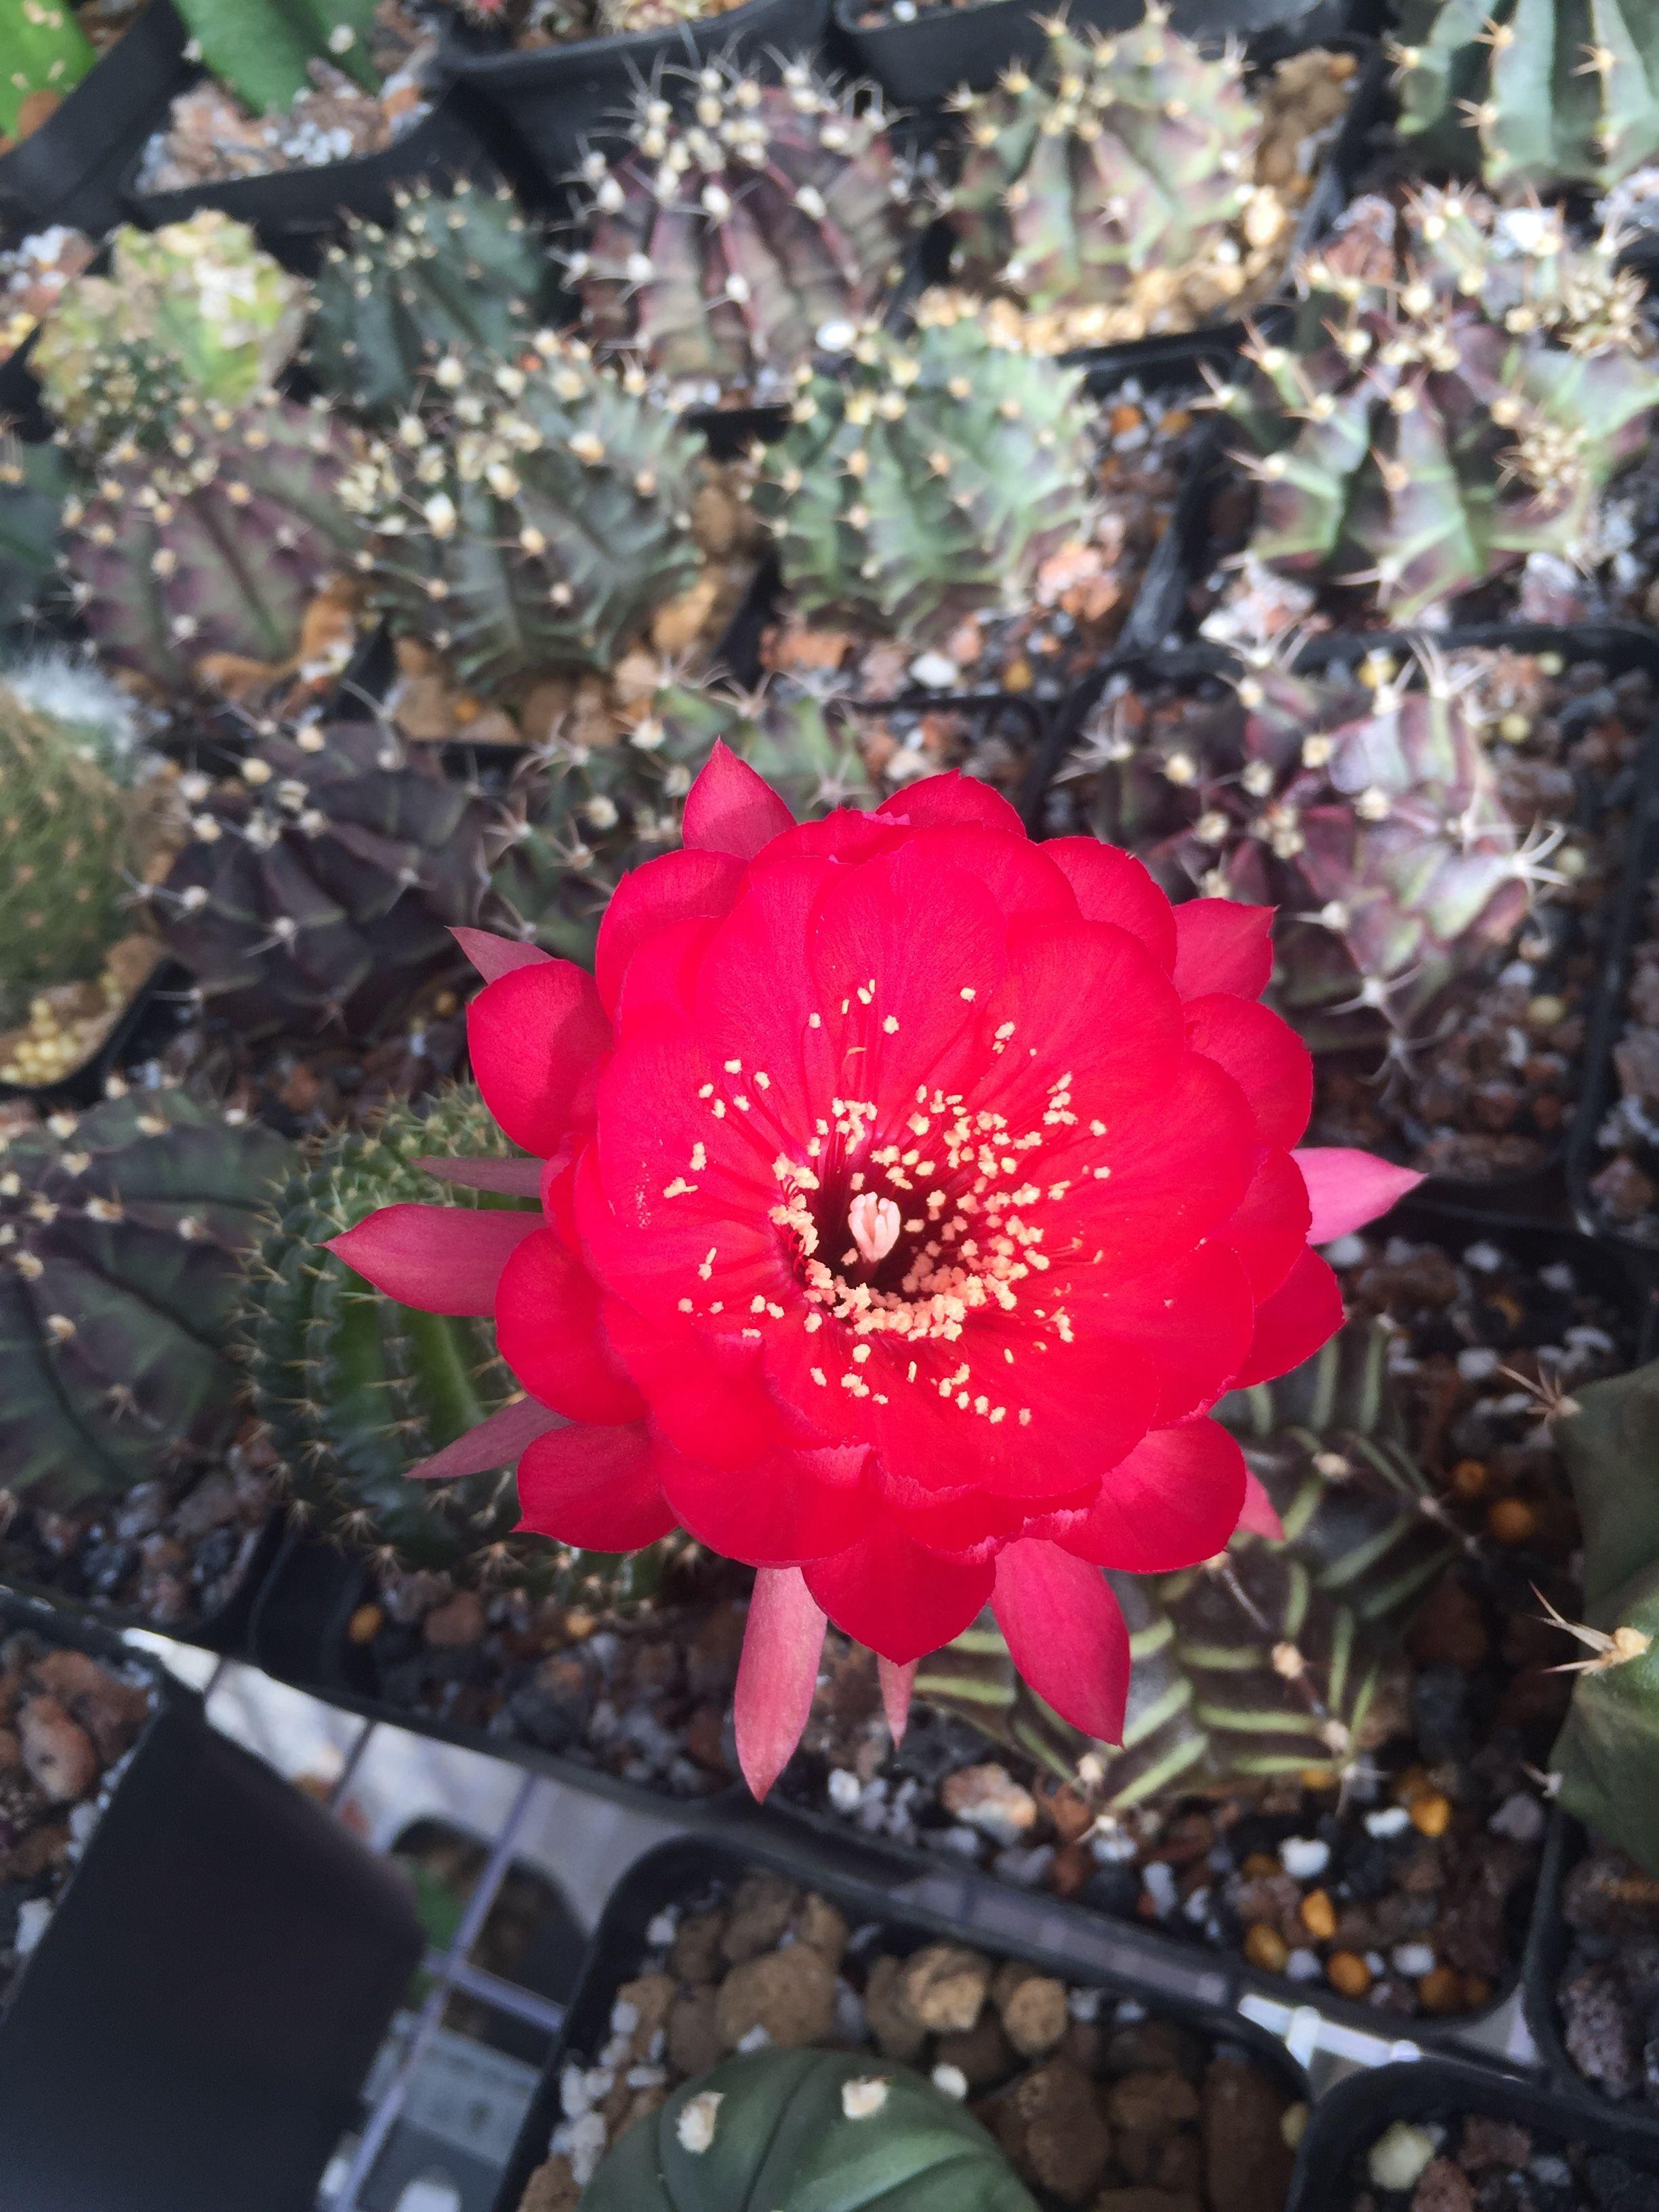 Happy New Year 2018 Cacti Cactii Cactus Succulove Succulents